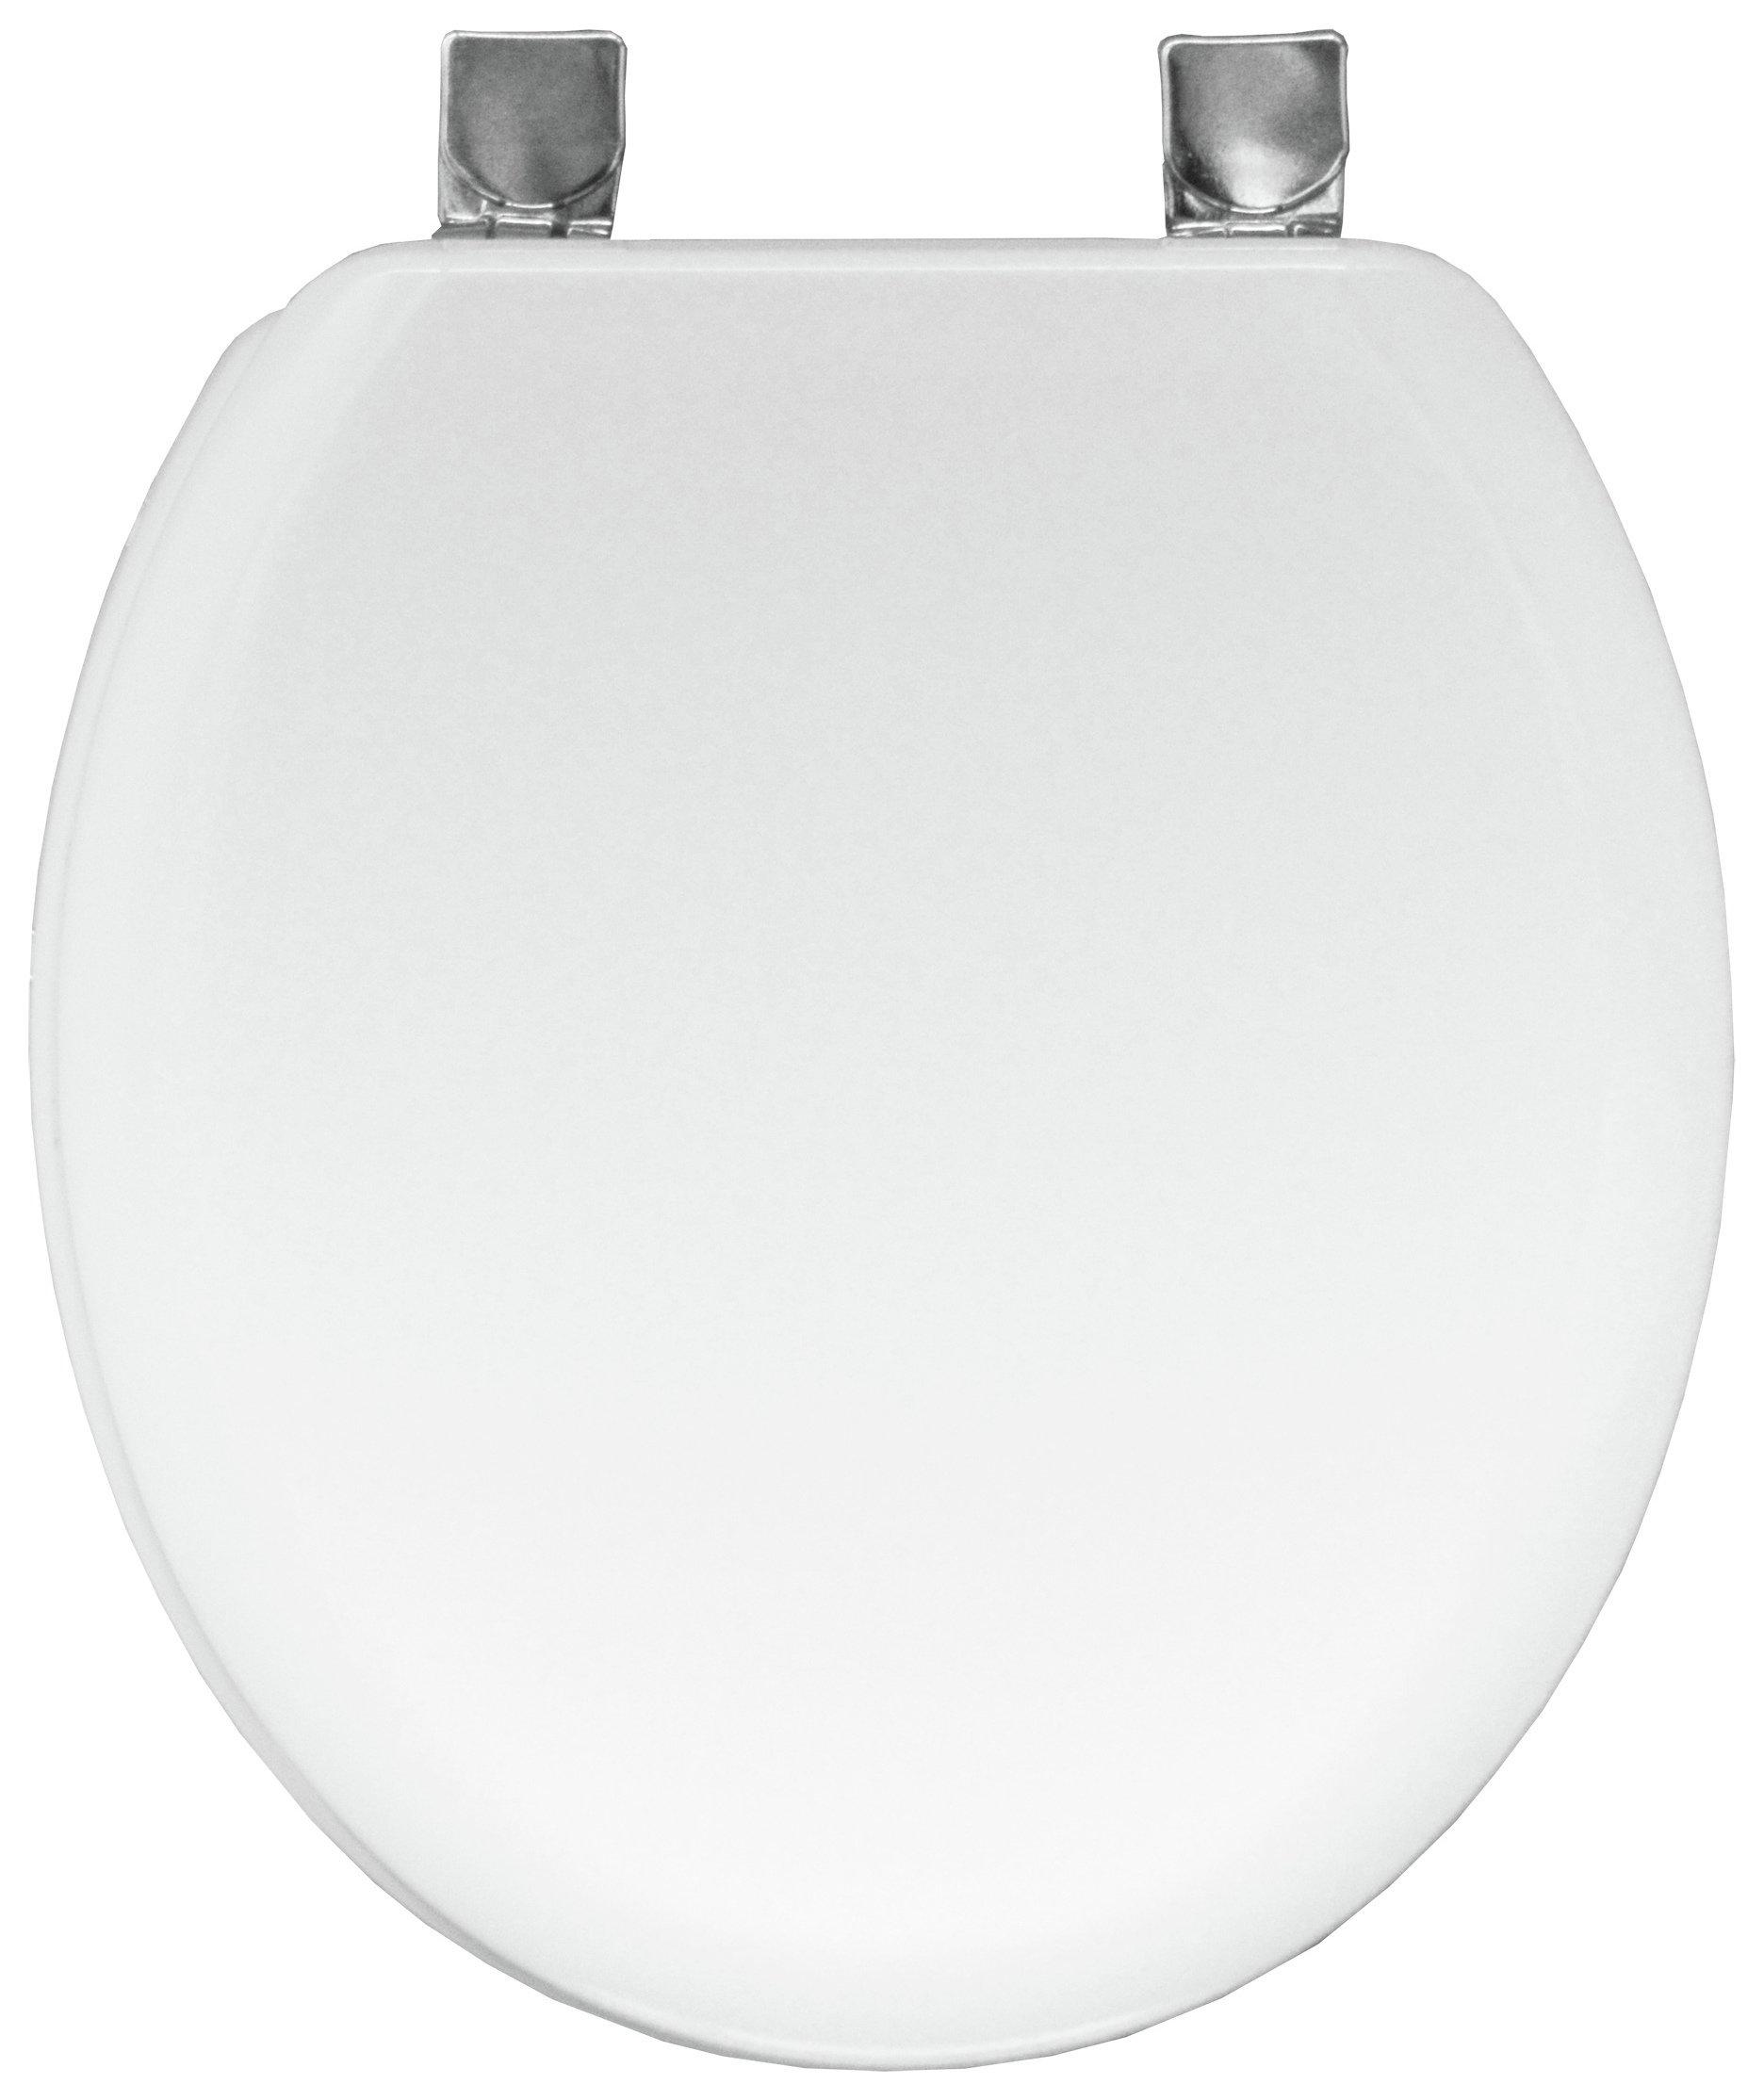 Bemis Chicago Statite Toilet Seat - White